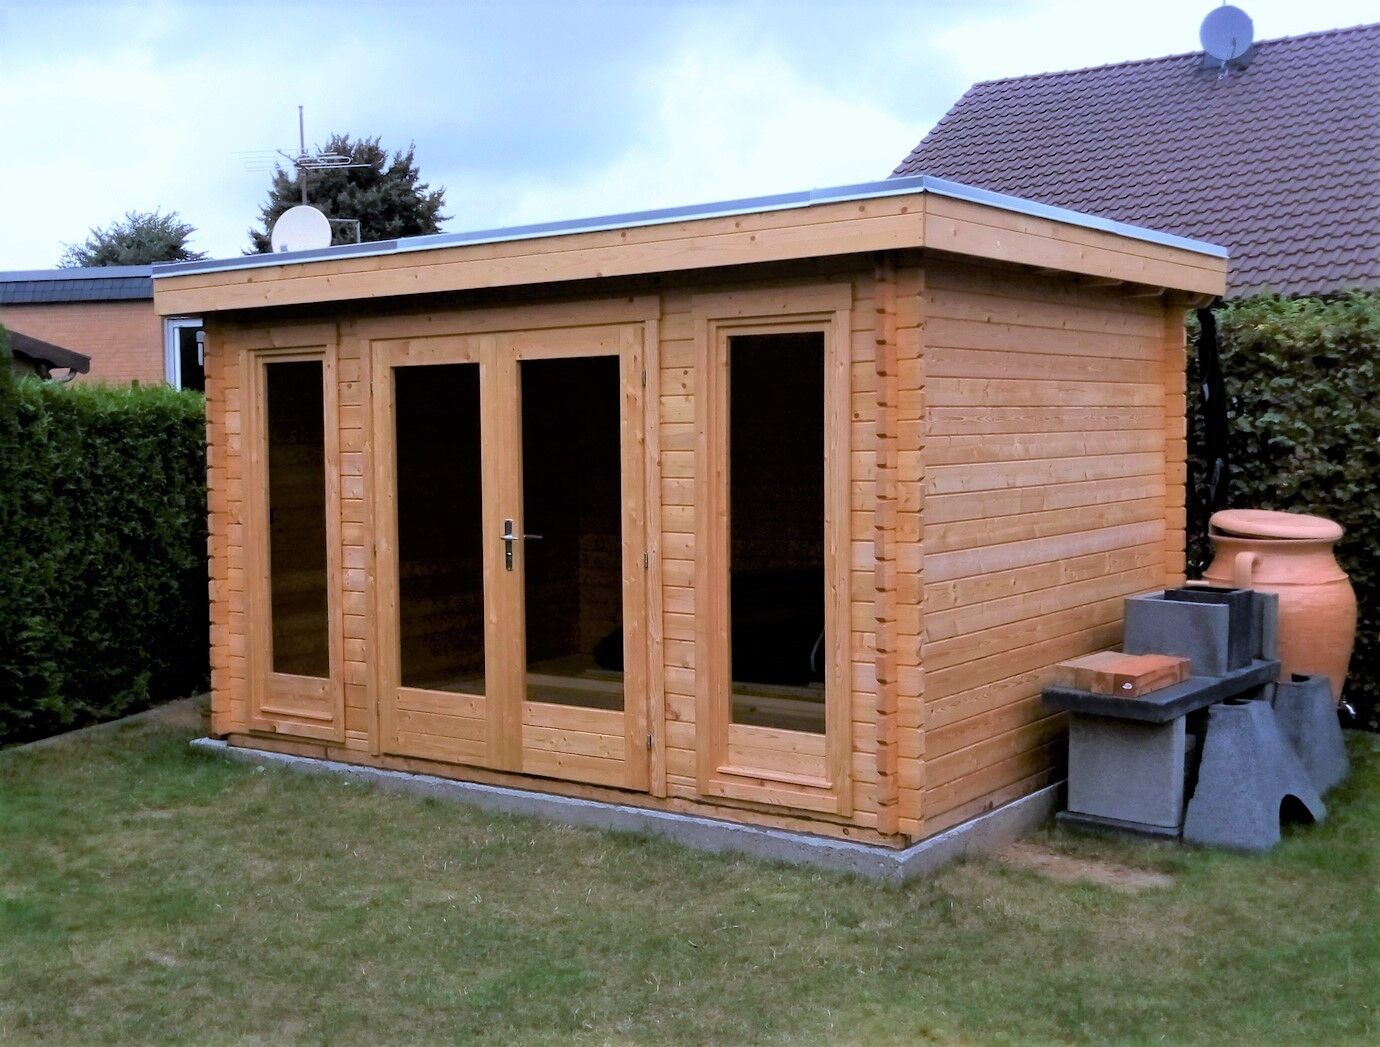 Flachdach Gartenhaus Holz Modern 40mm 3.9x3M, Blockhaus